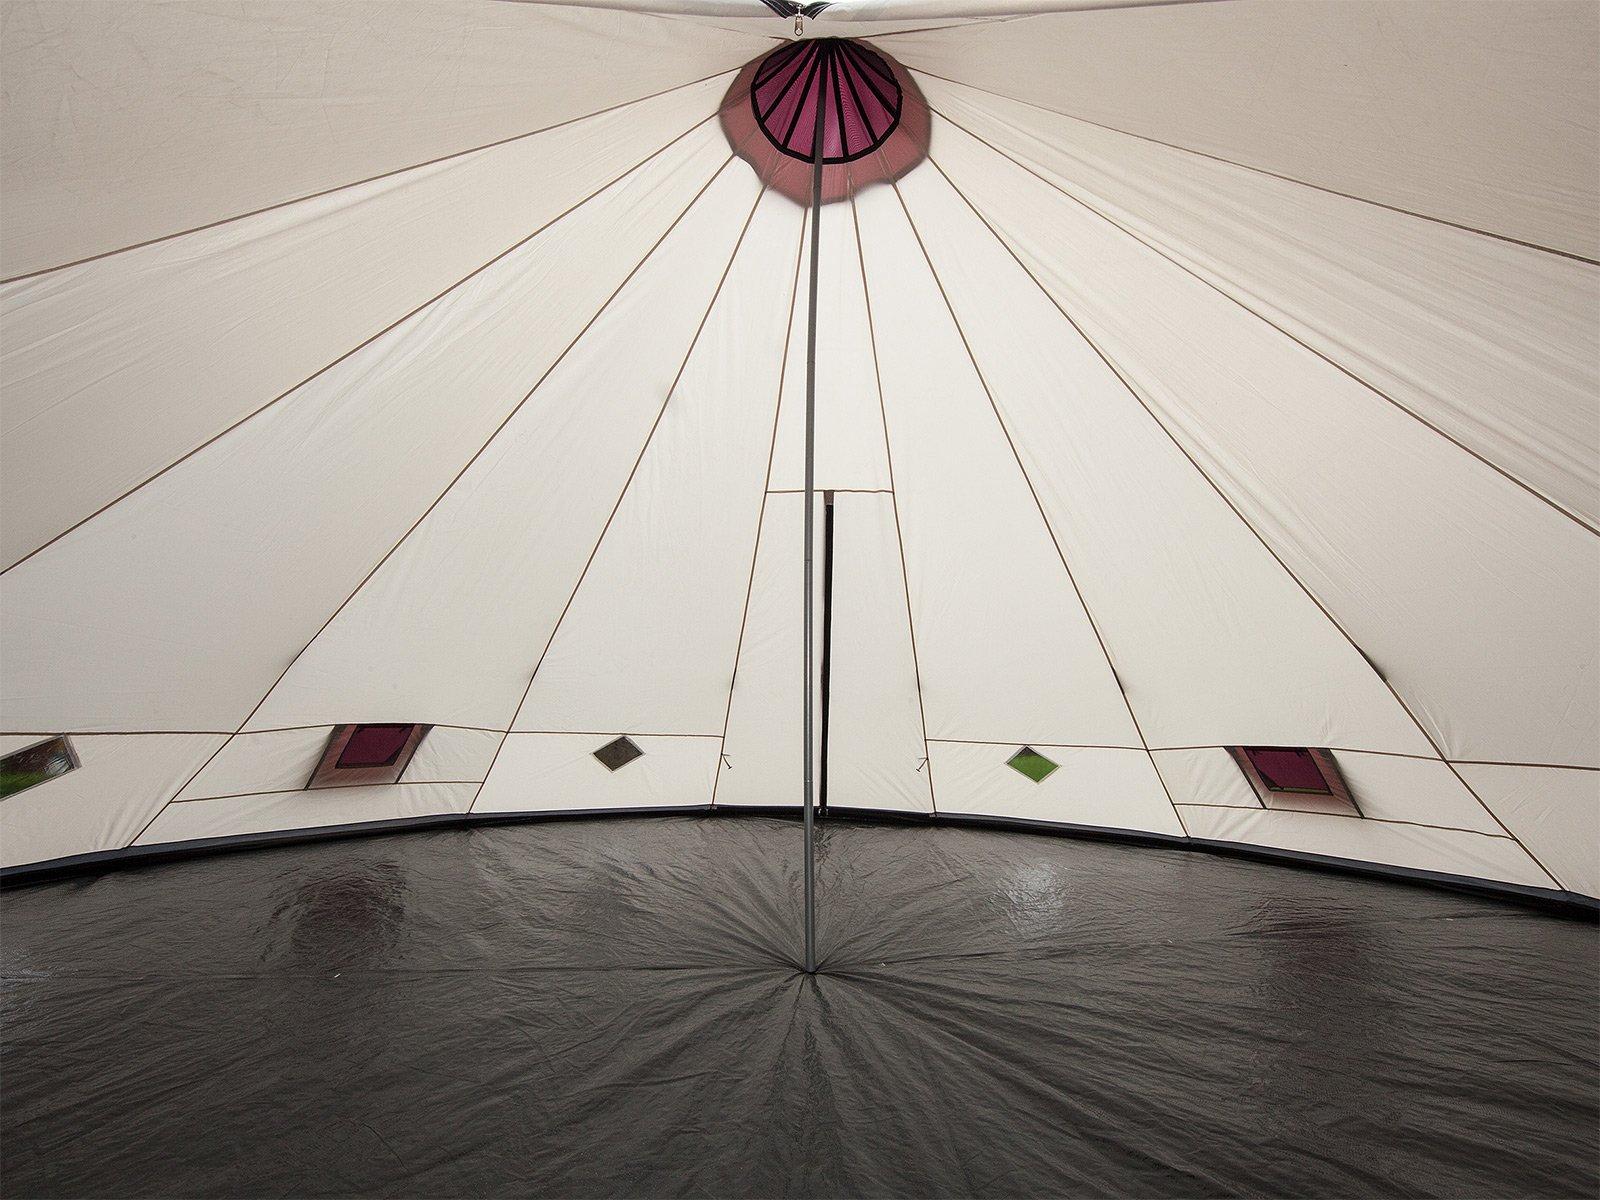 Skandika Teepee 301 Wigwam Style Indiana Tepee Tent, Sewn-In Groundsheet, 300 cm Peak Height, 3000 mm Water Column, Sand/Burgundy, 12-Person 4